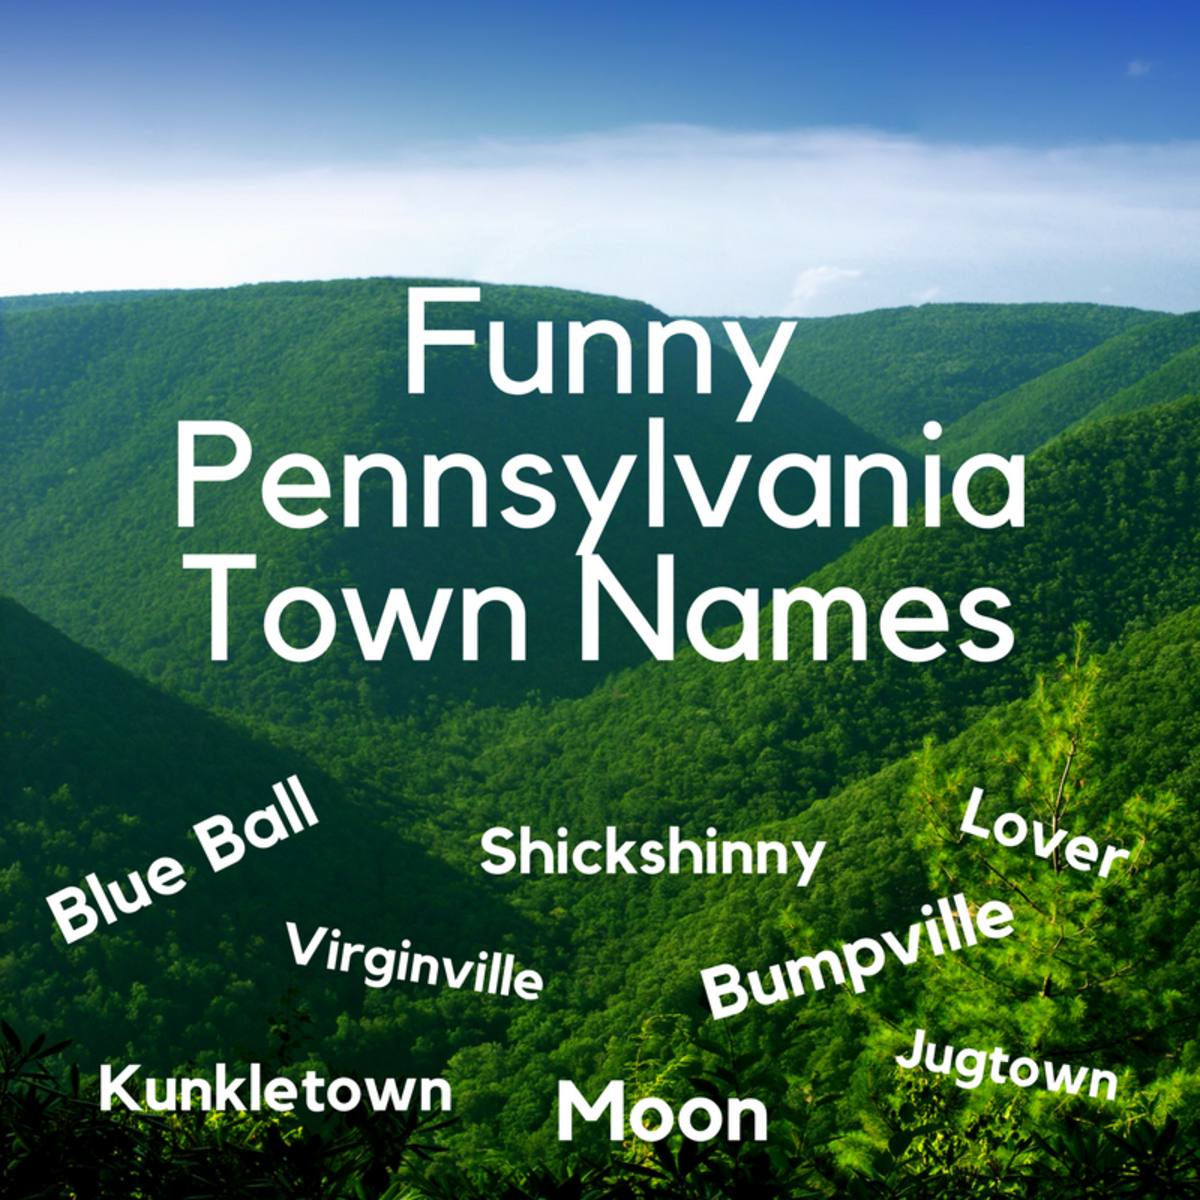 Funny Pennsylvania Town Names